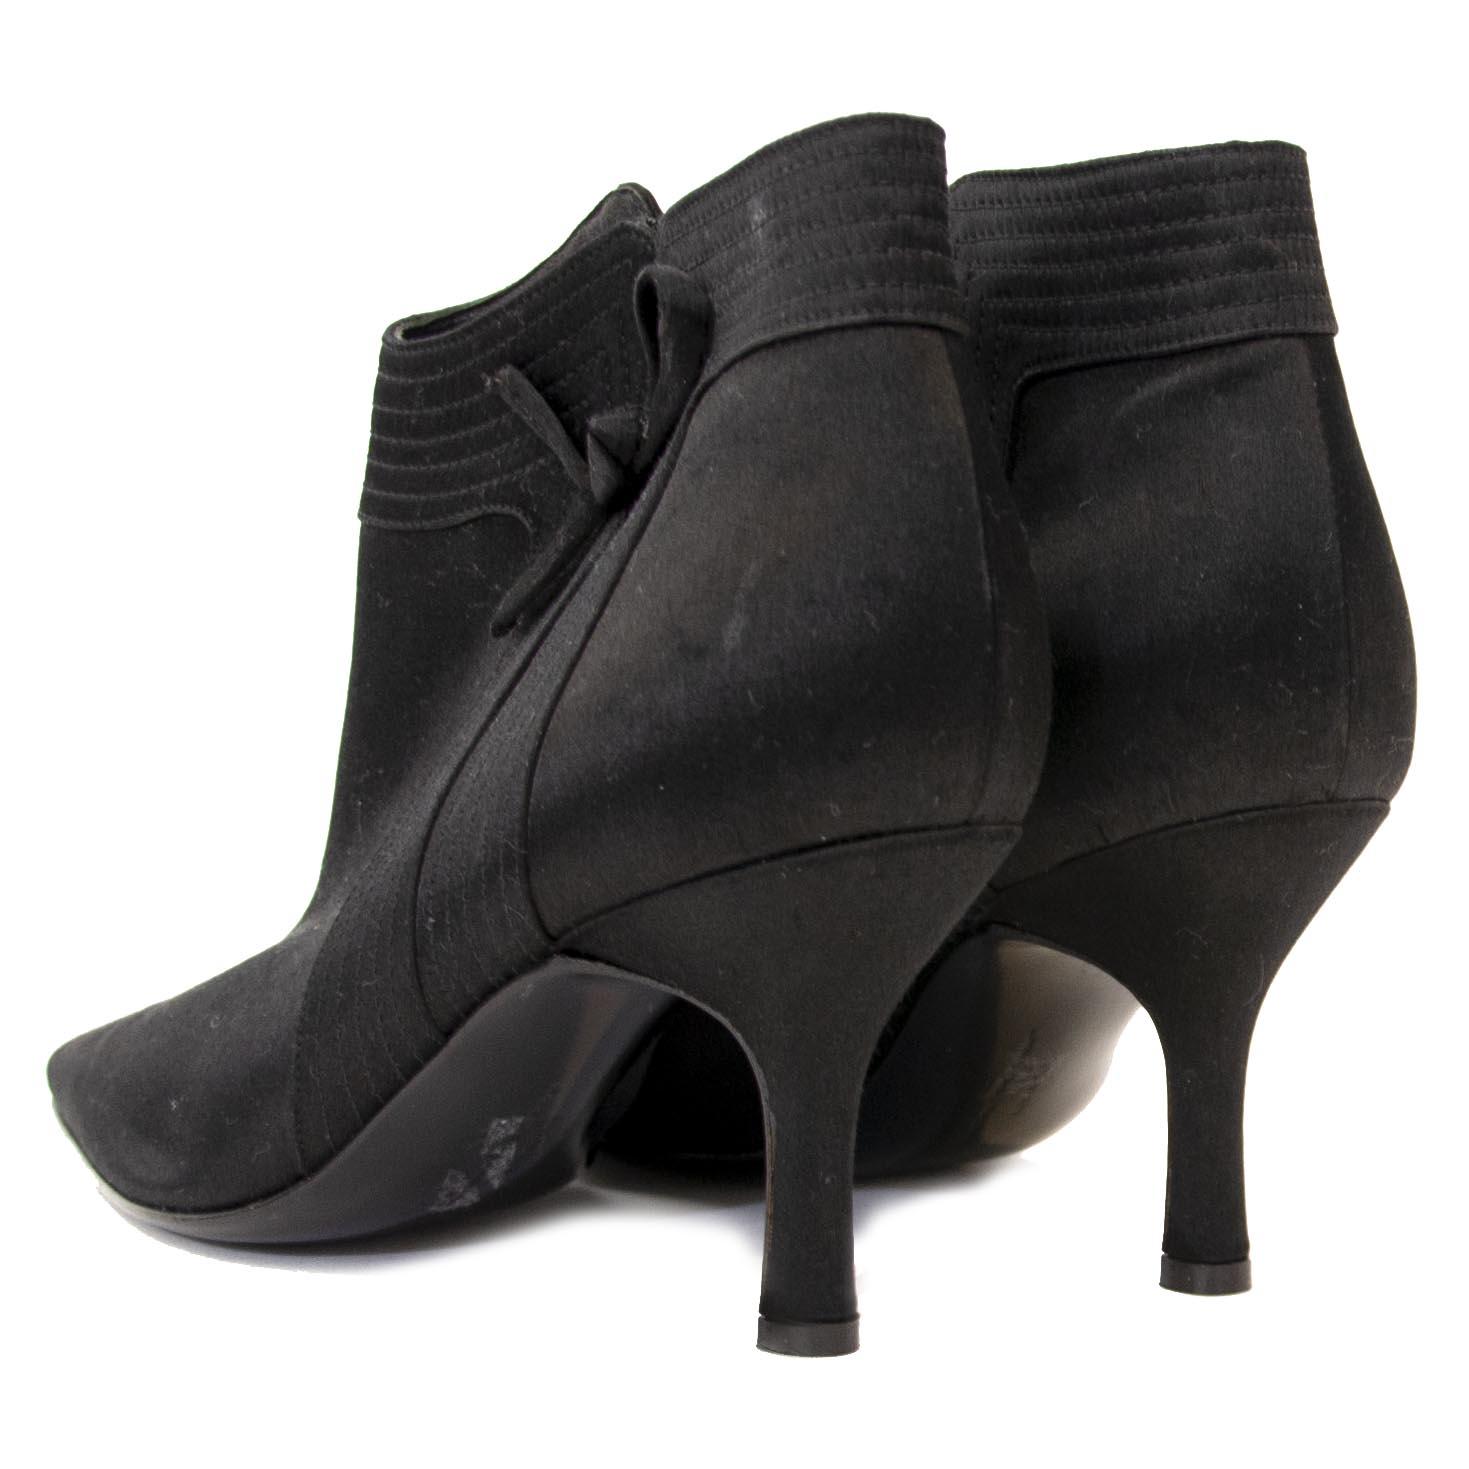 857f3ef71dc Labellov Shop Vintage Luxury Designer Handbags & Fashion & Shoes ...